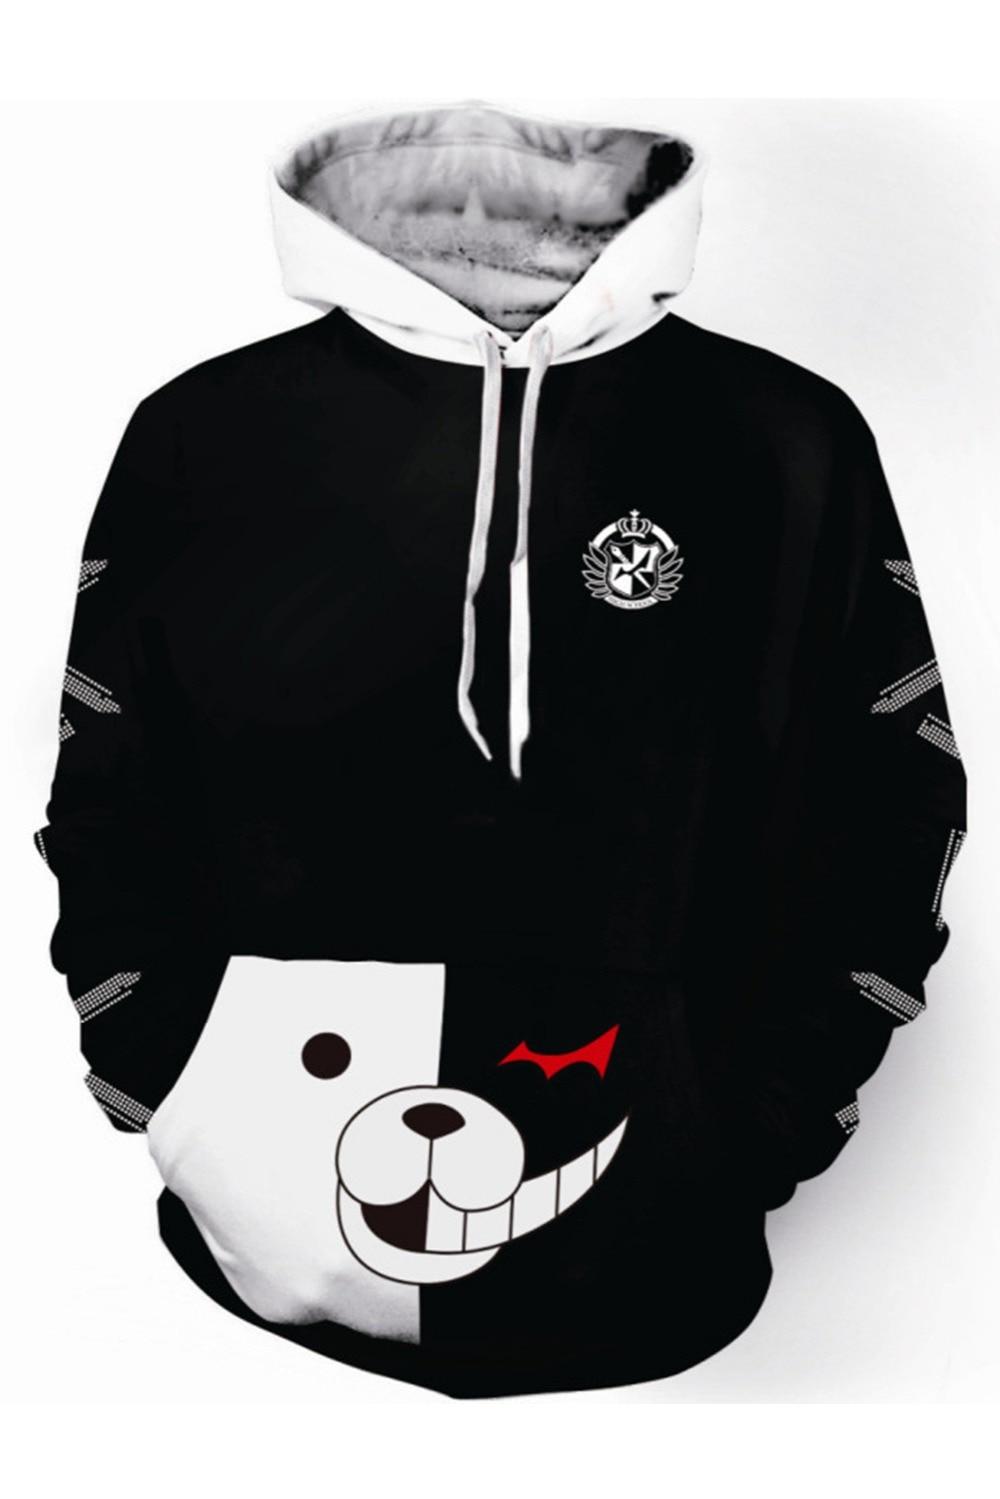 Danganronpa Monokuma Cosplay Hoodie Monokuma Anime Hoodie Black and White Bear Long Sleeve